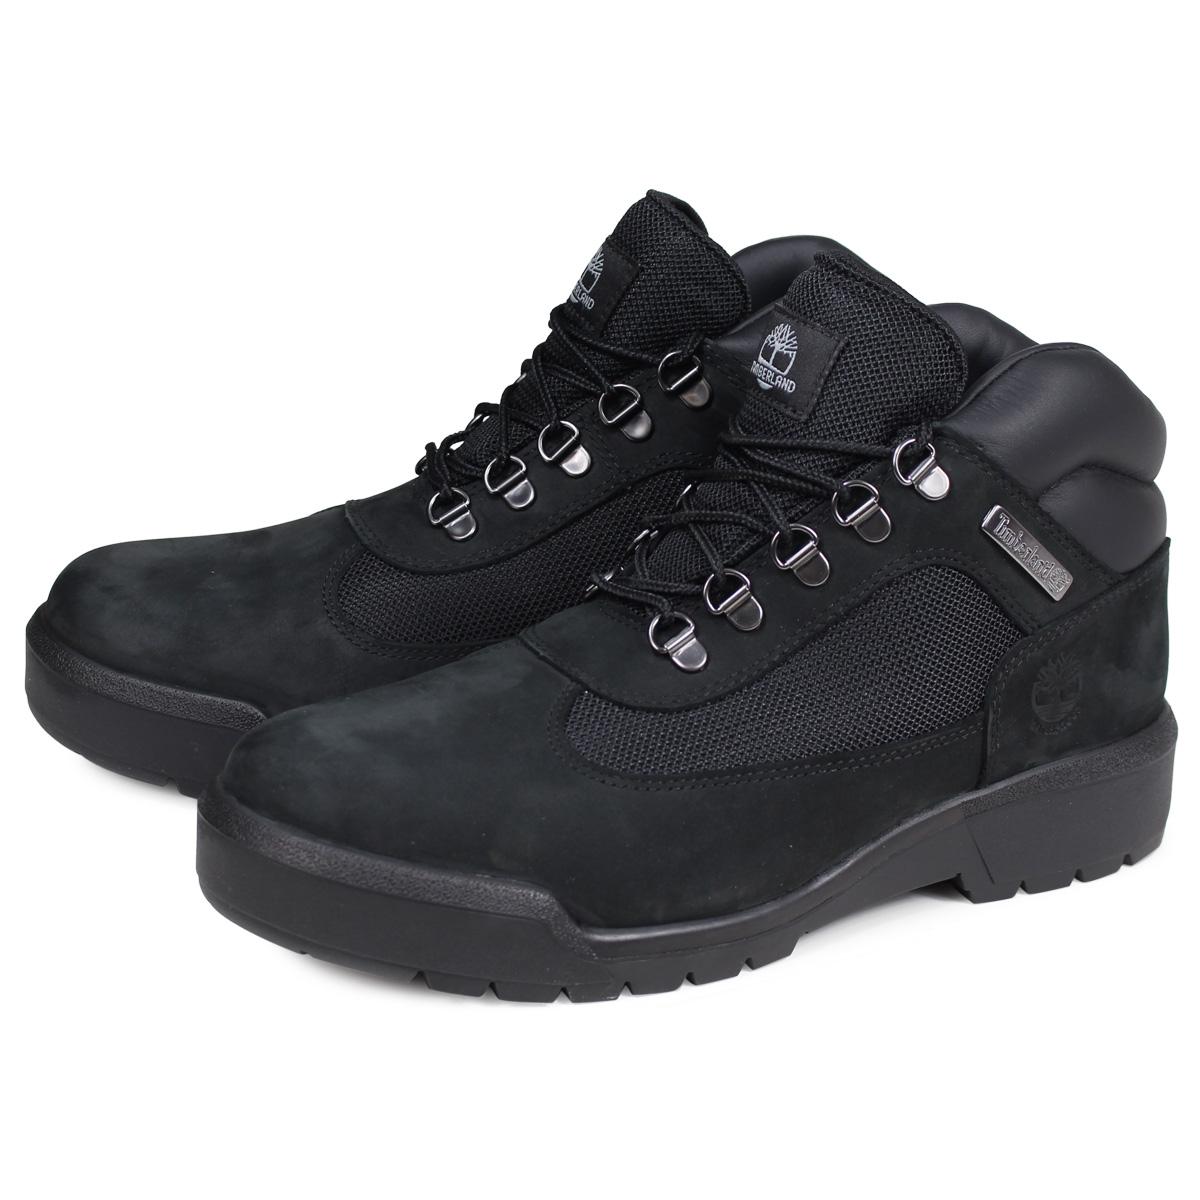 Timberland FIELD BOOT F L WATERPROOF ティンバーランド フィールド ブーツ メンズ Mワイズ 防水 ブラック 黒 A1A12H9IWEYD2